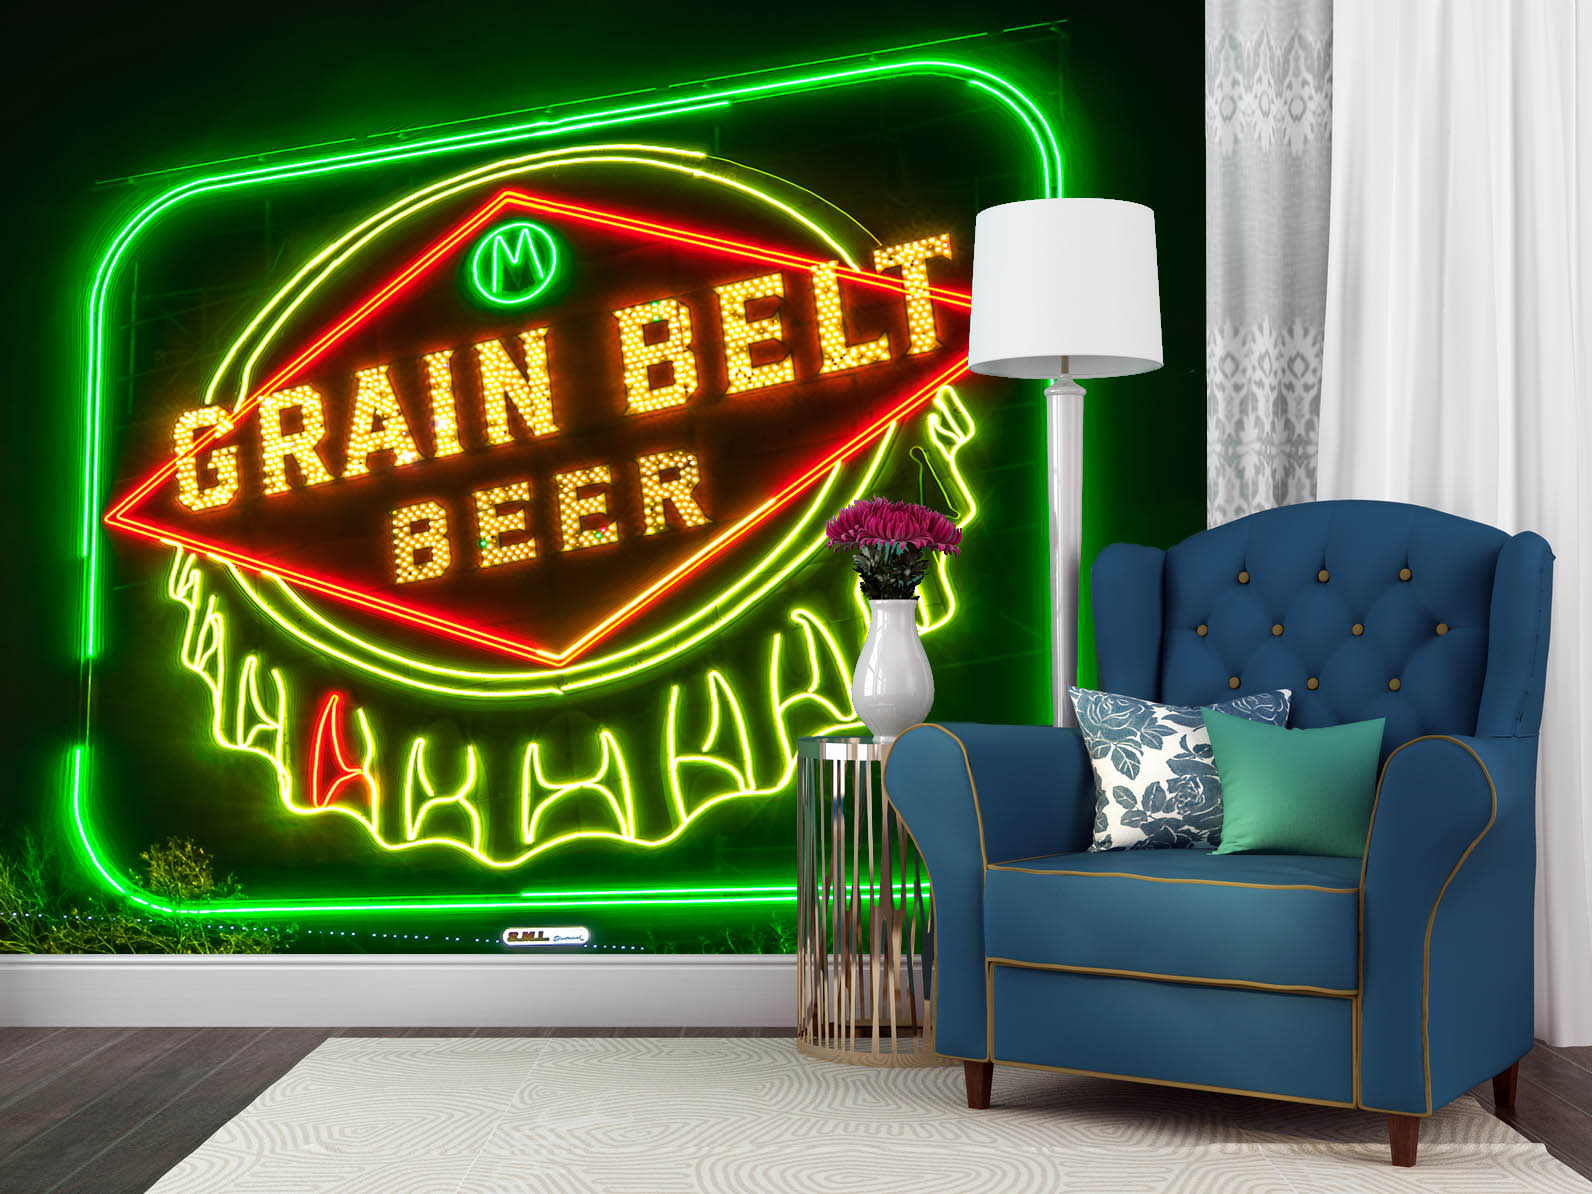 Grain belt beer sign vbqivw